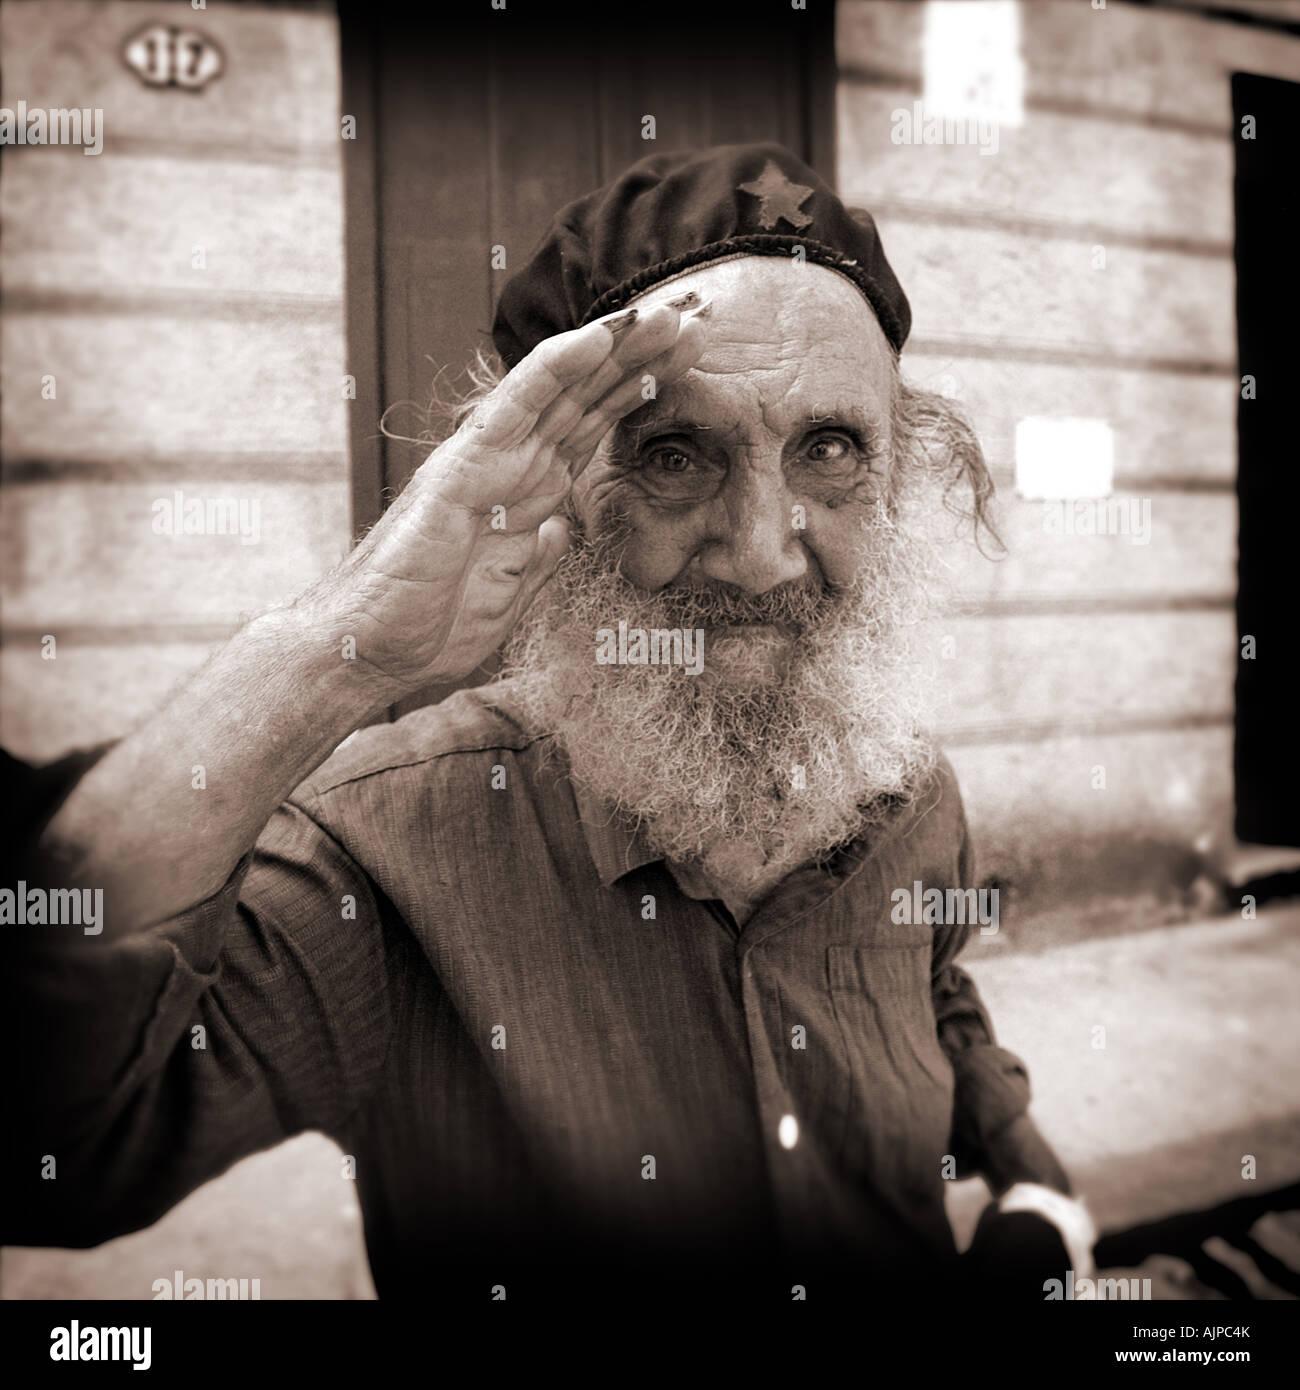 Che Guevara look alike in Havana Cuba - Stock Image